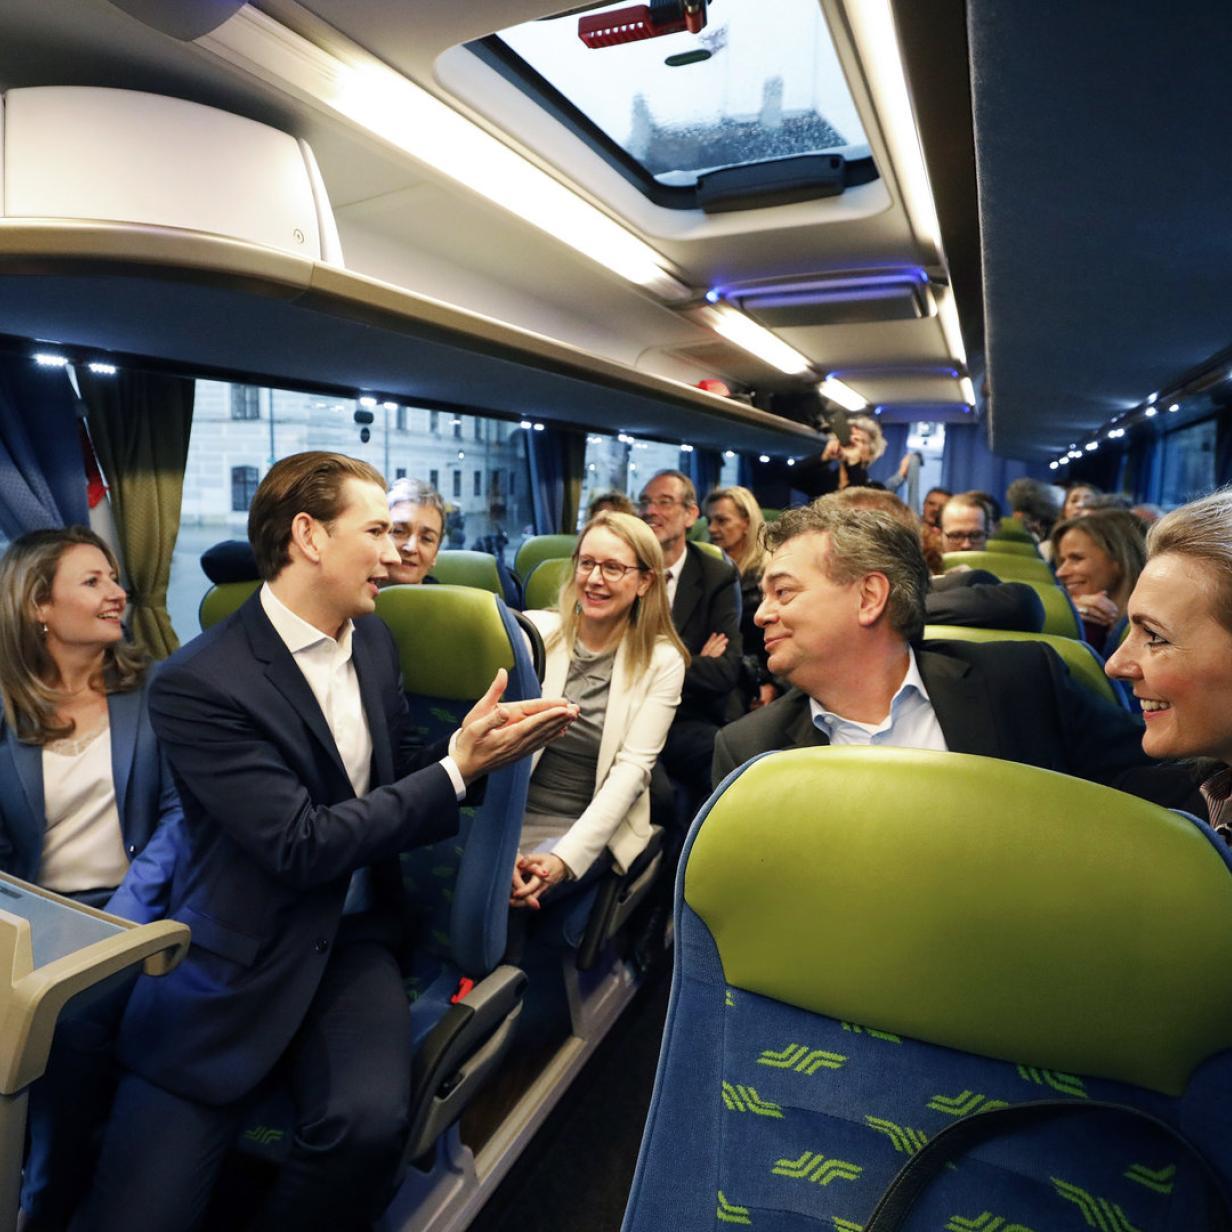 Klassenfahrt-Feeling im Koalitionsbus